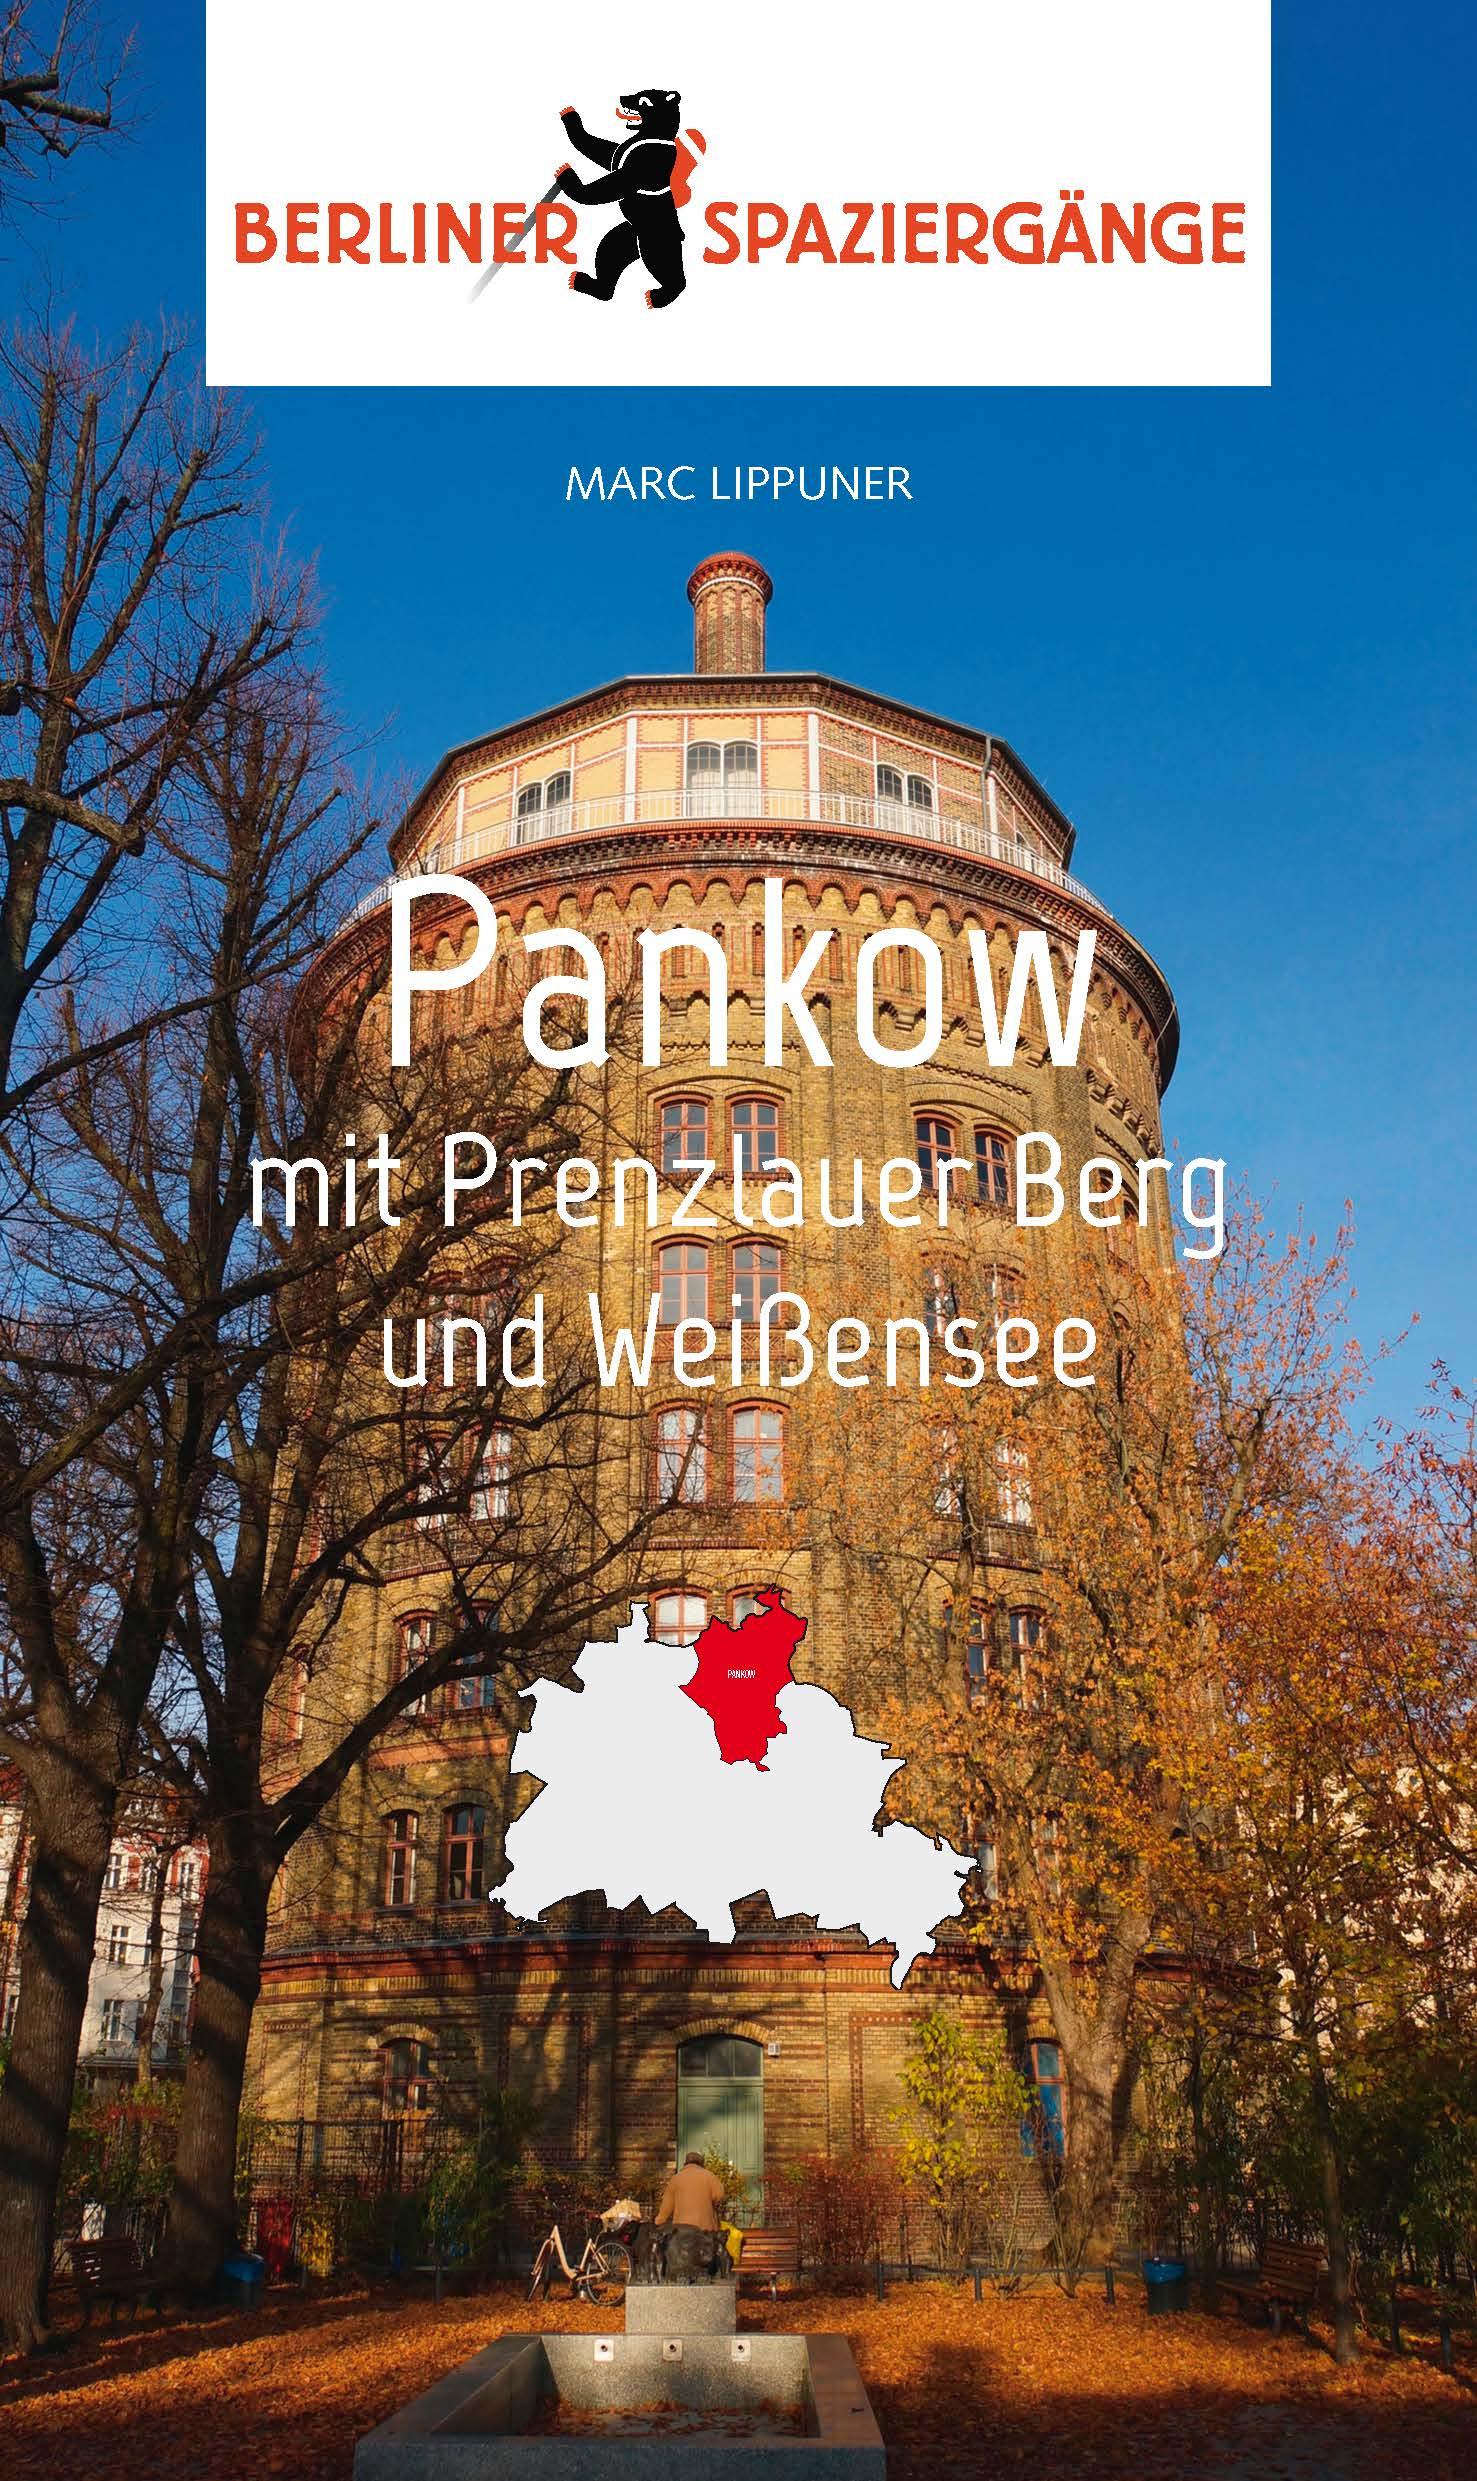 Pankow Berlin Spaziergänge Buch Führer Cover